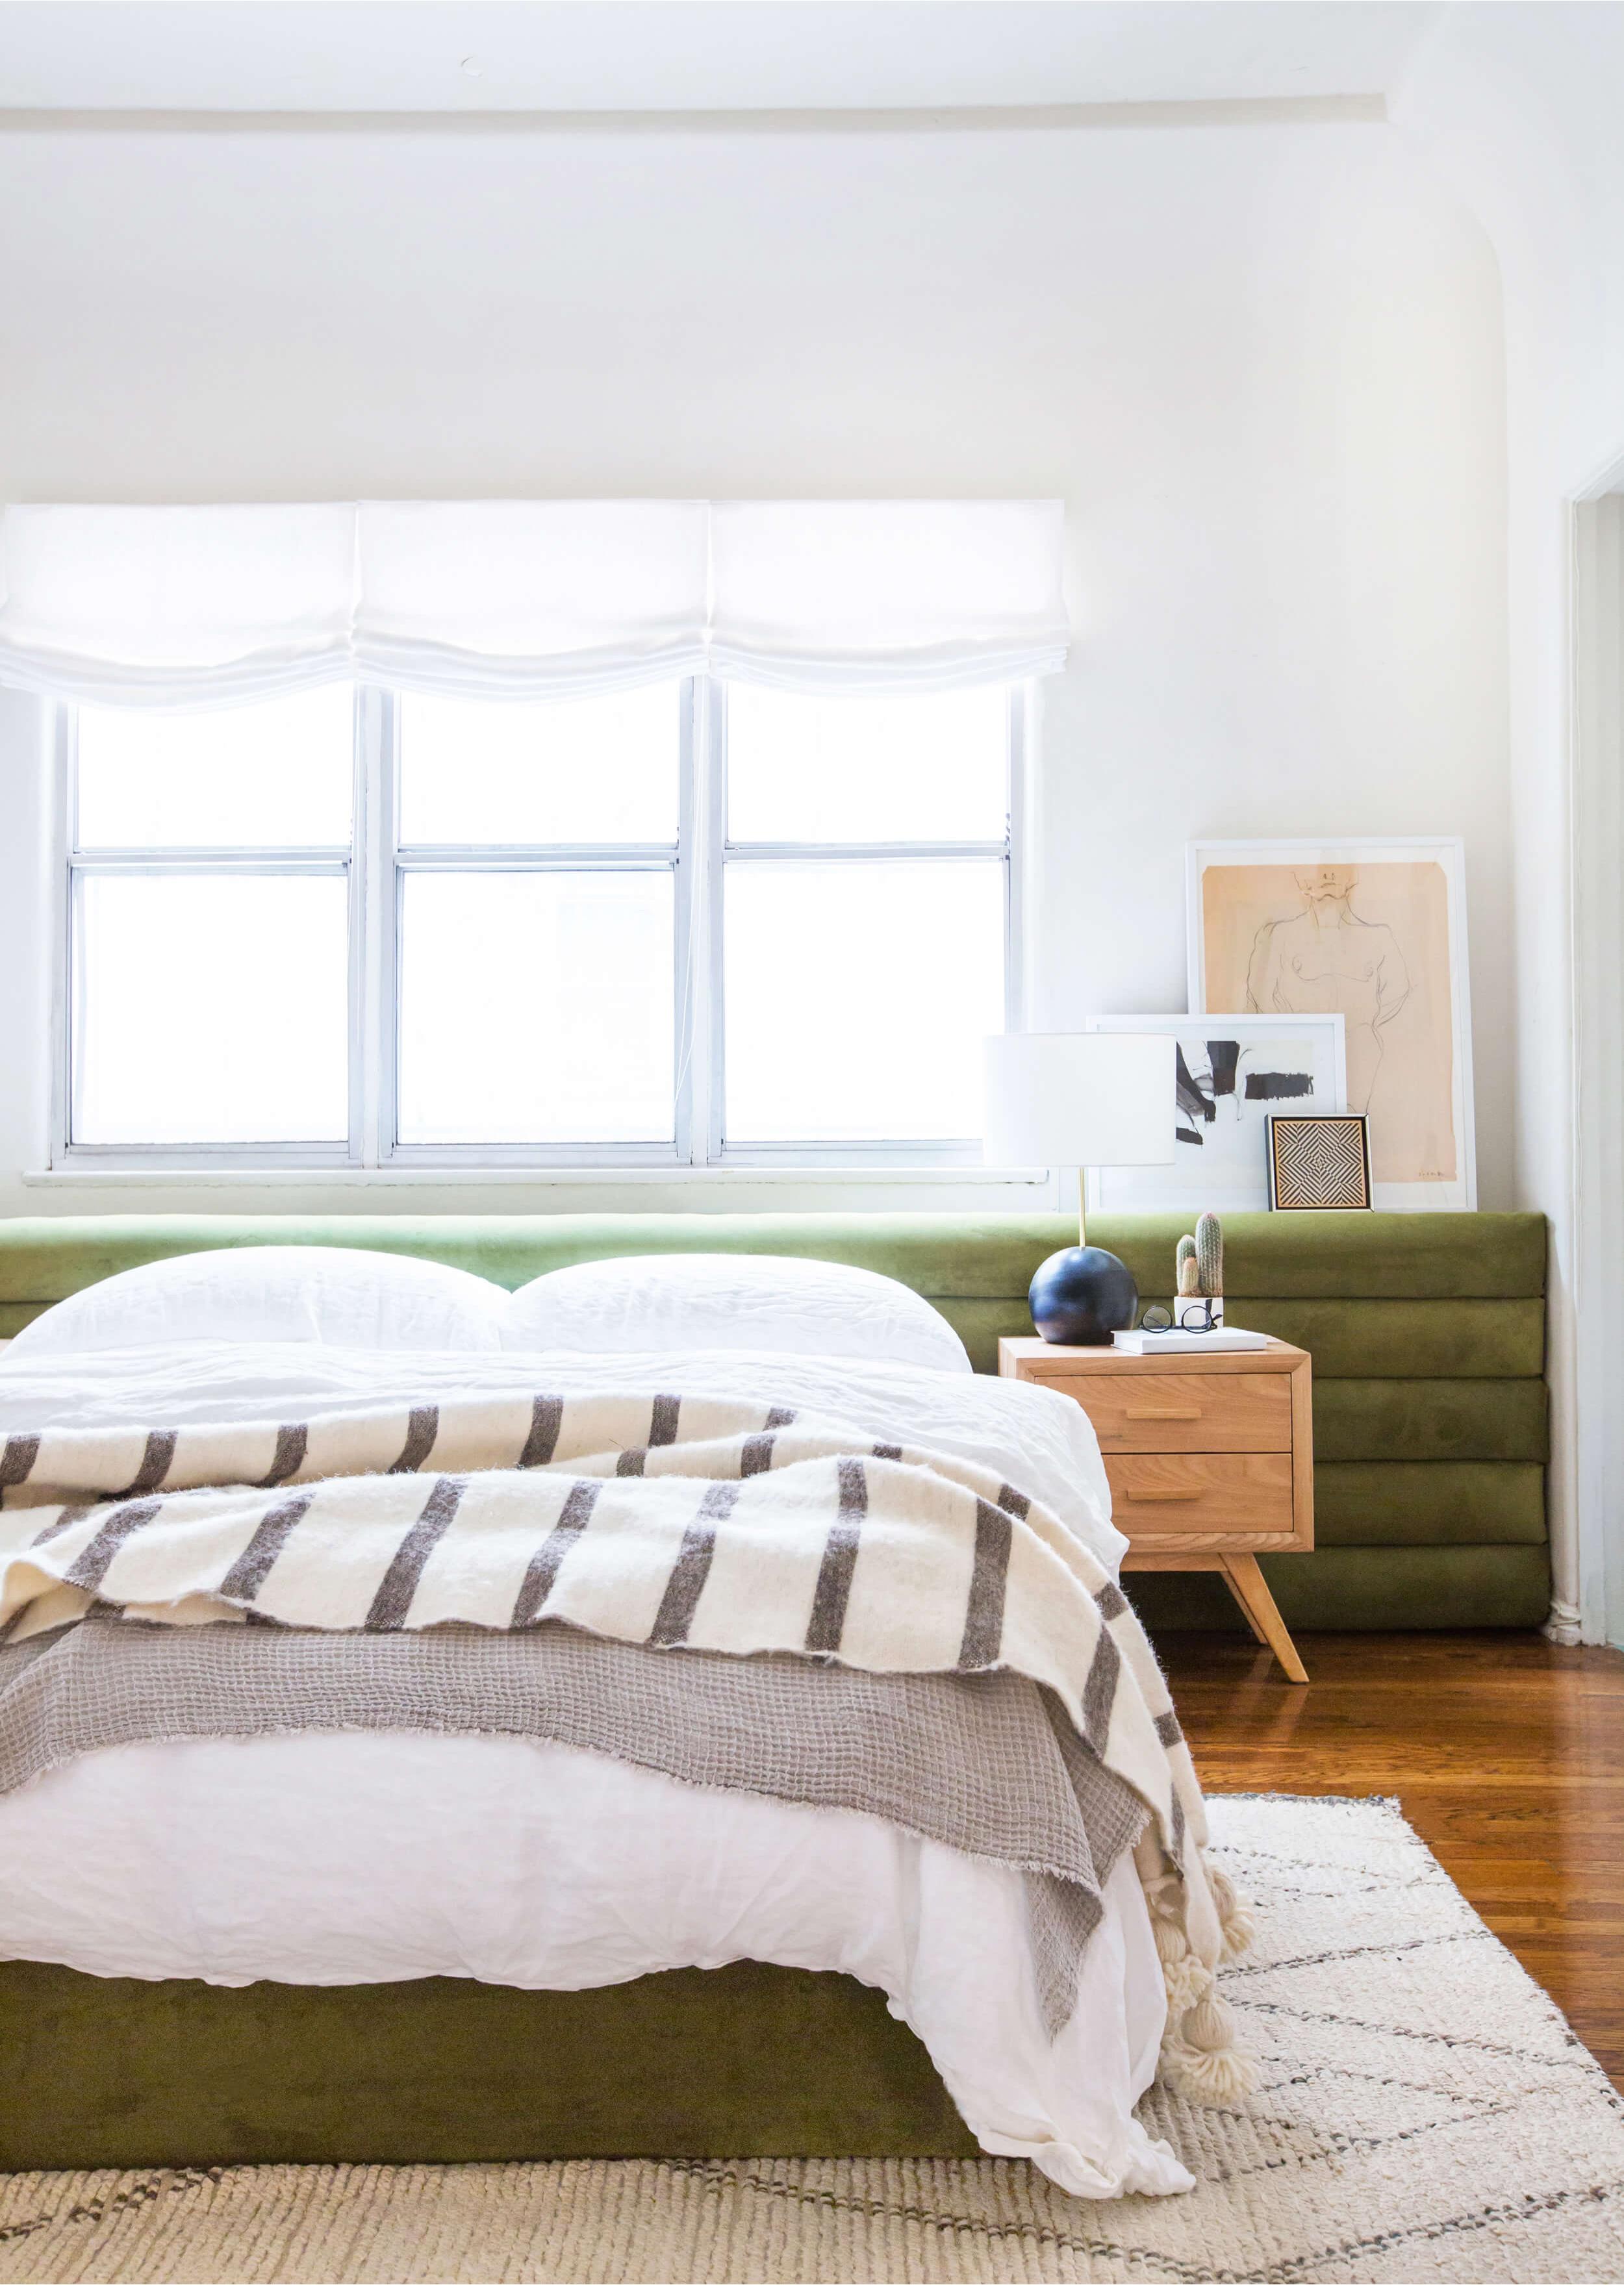 Bedroom Trend Alert Headboards Are So More